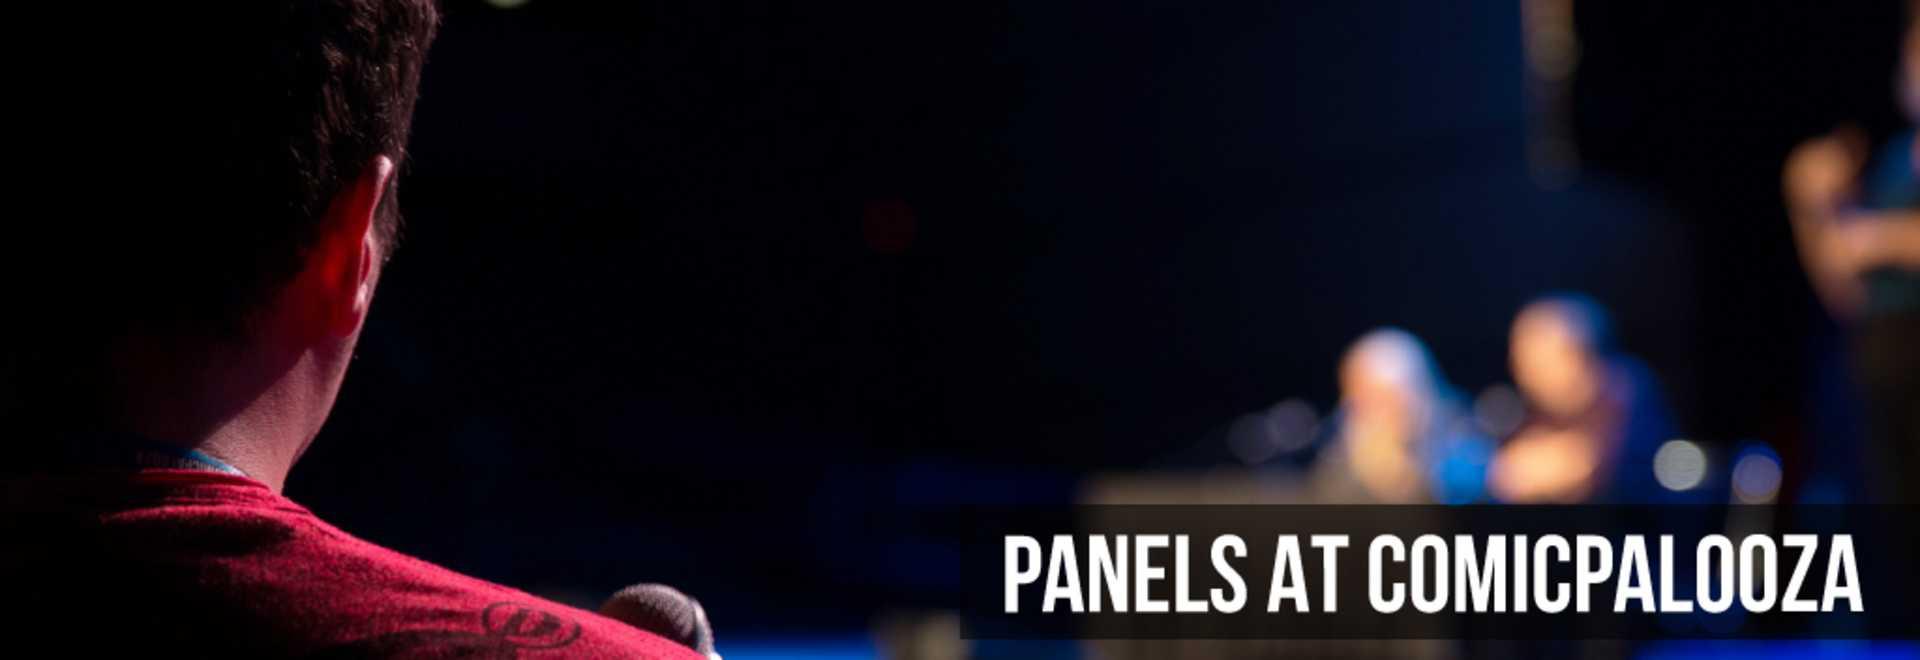 Panels Header